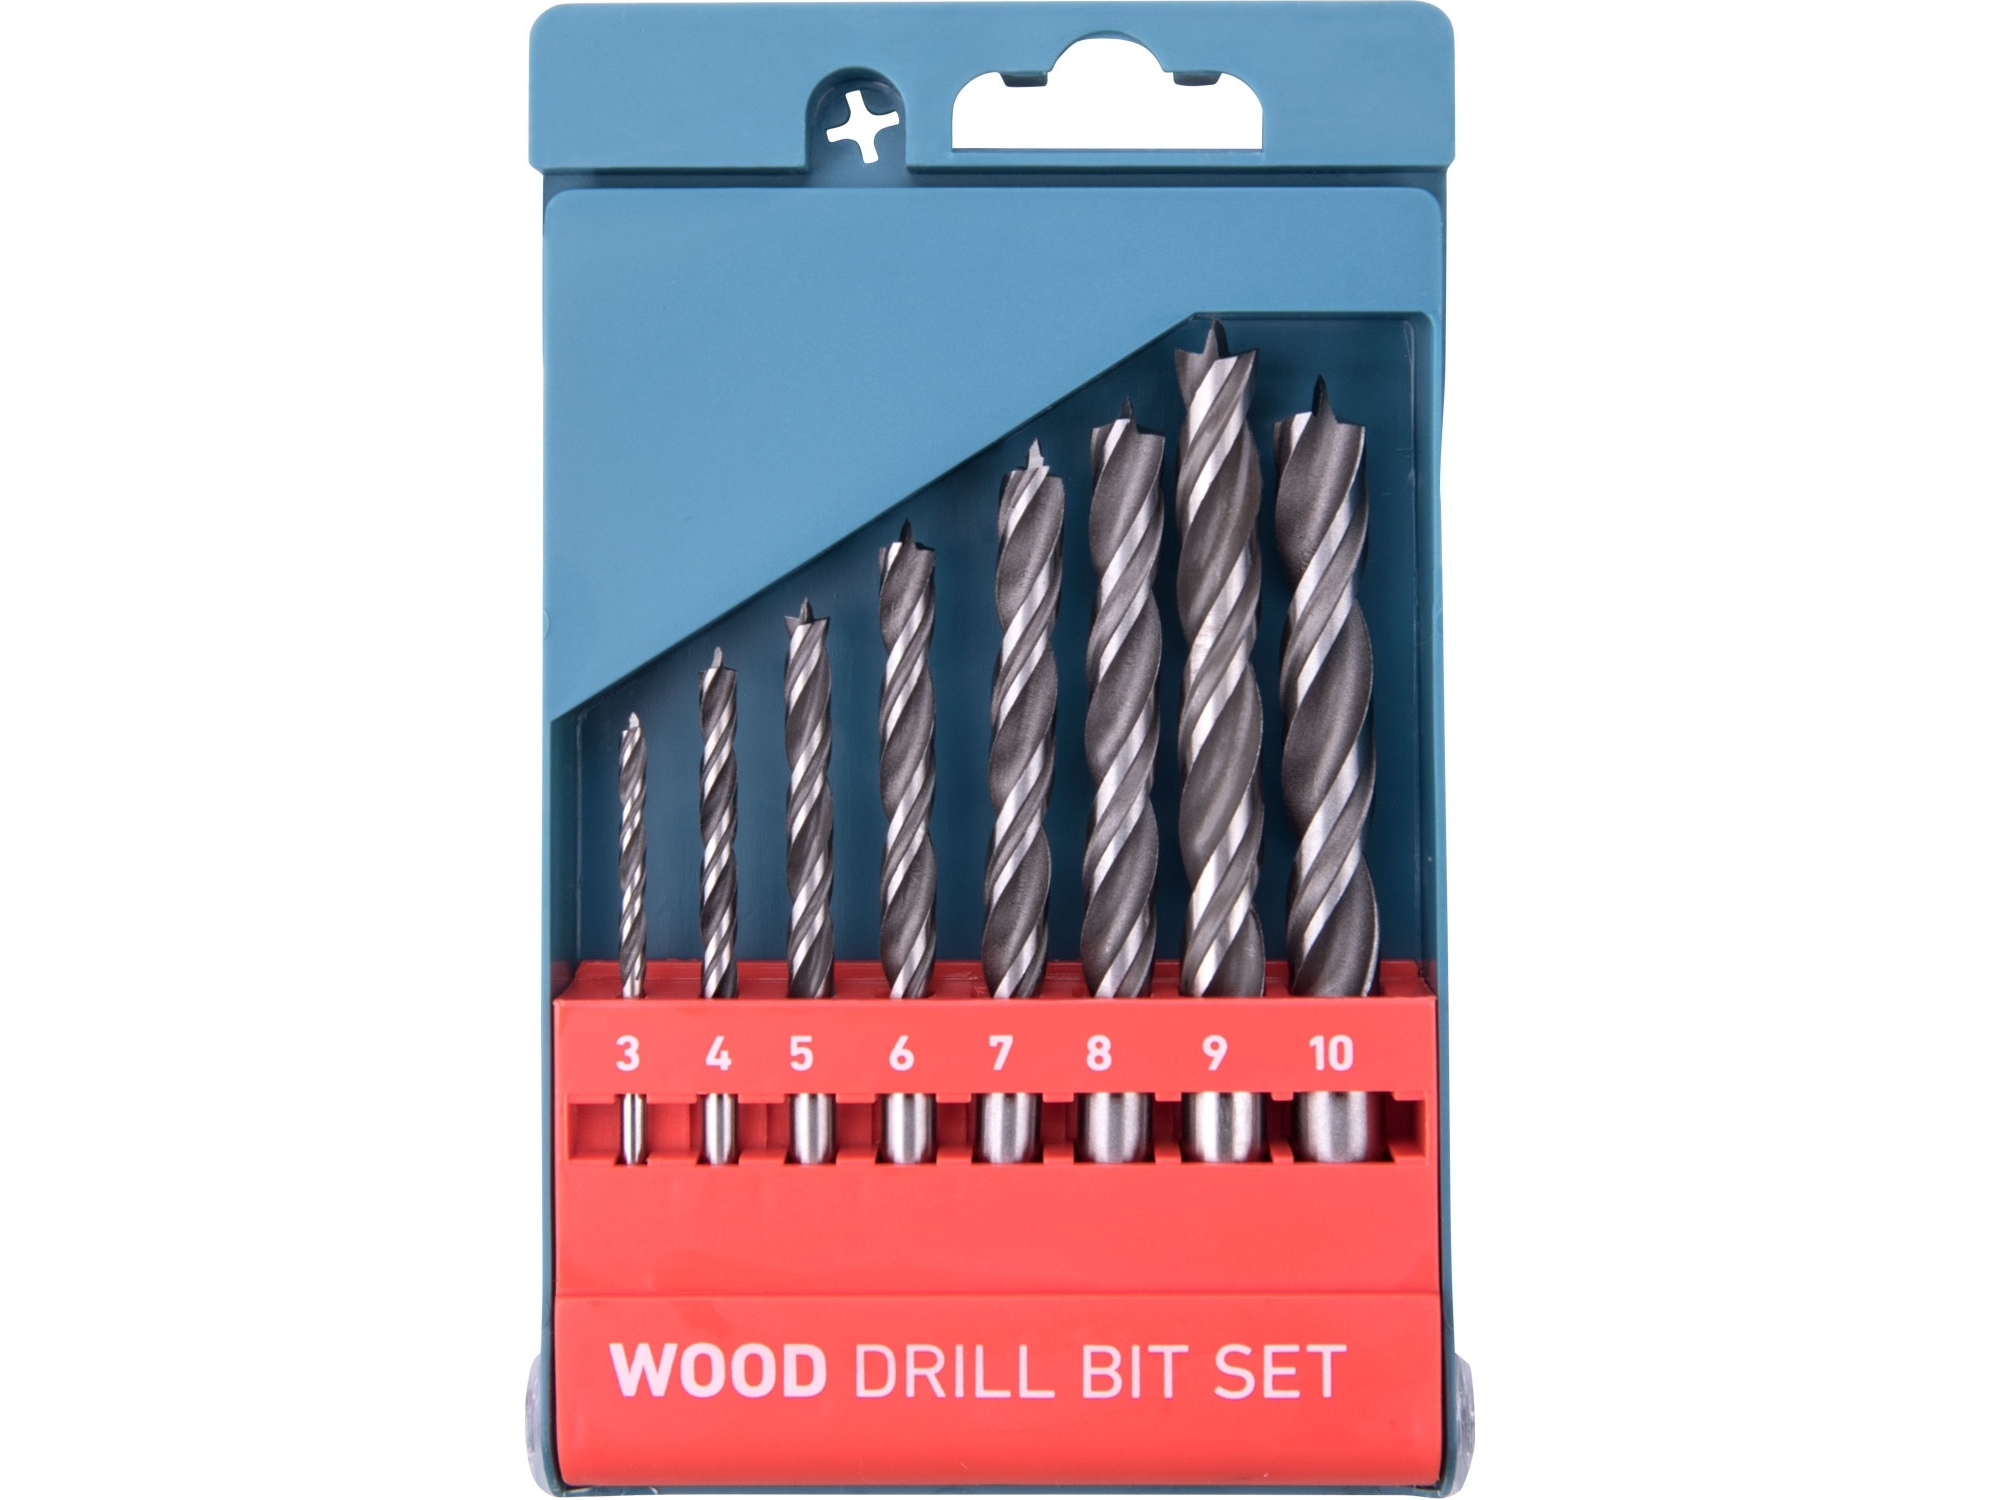 Vrtáky 3-10 8ks do dřeva Extol